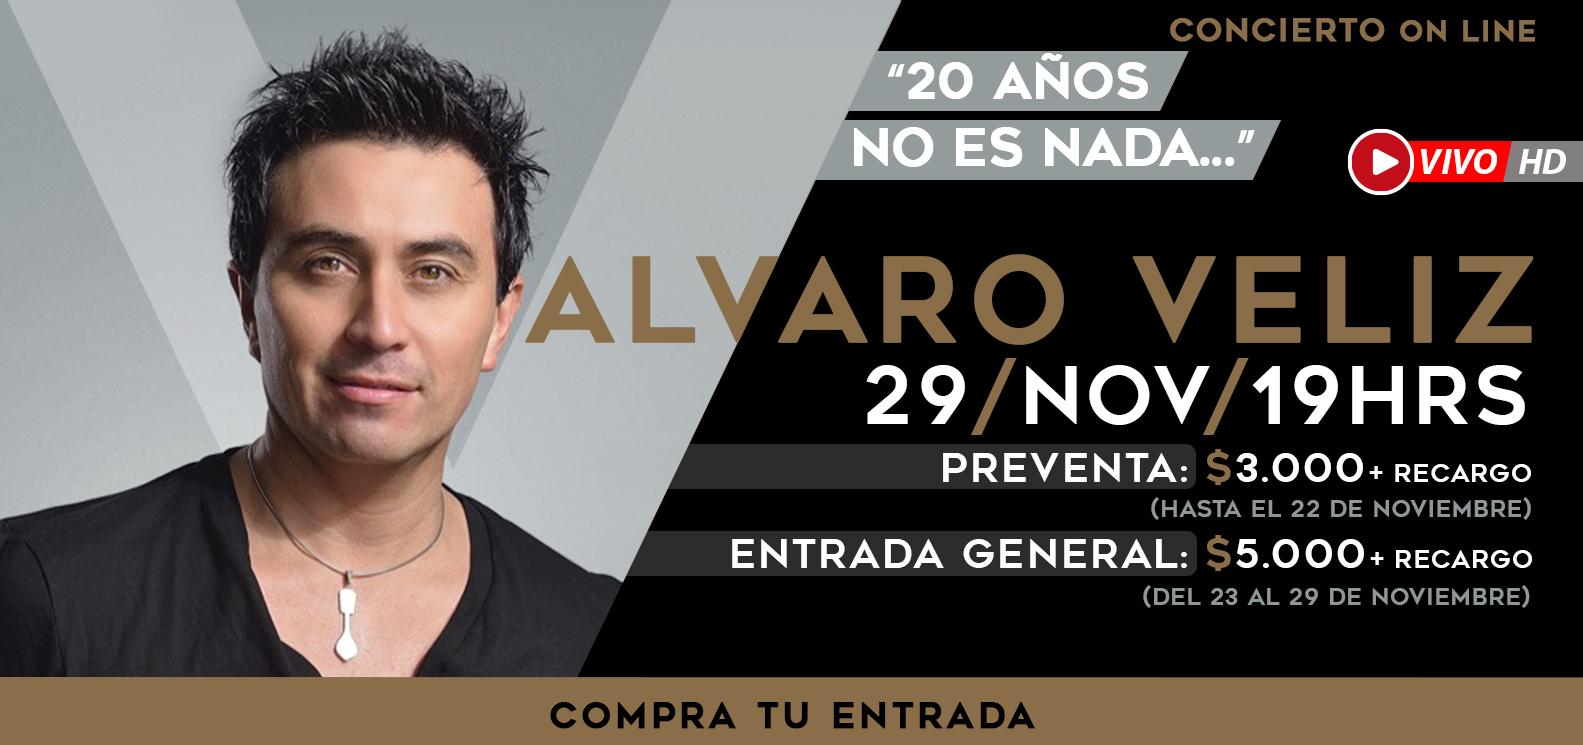 Alvaro Veliz